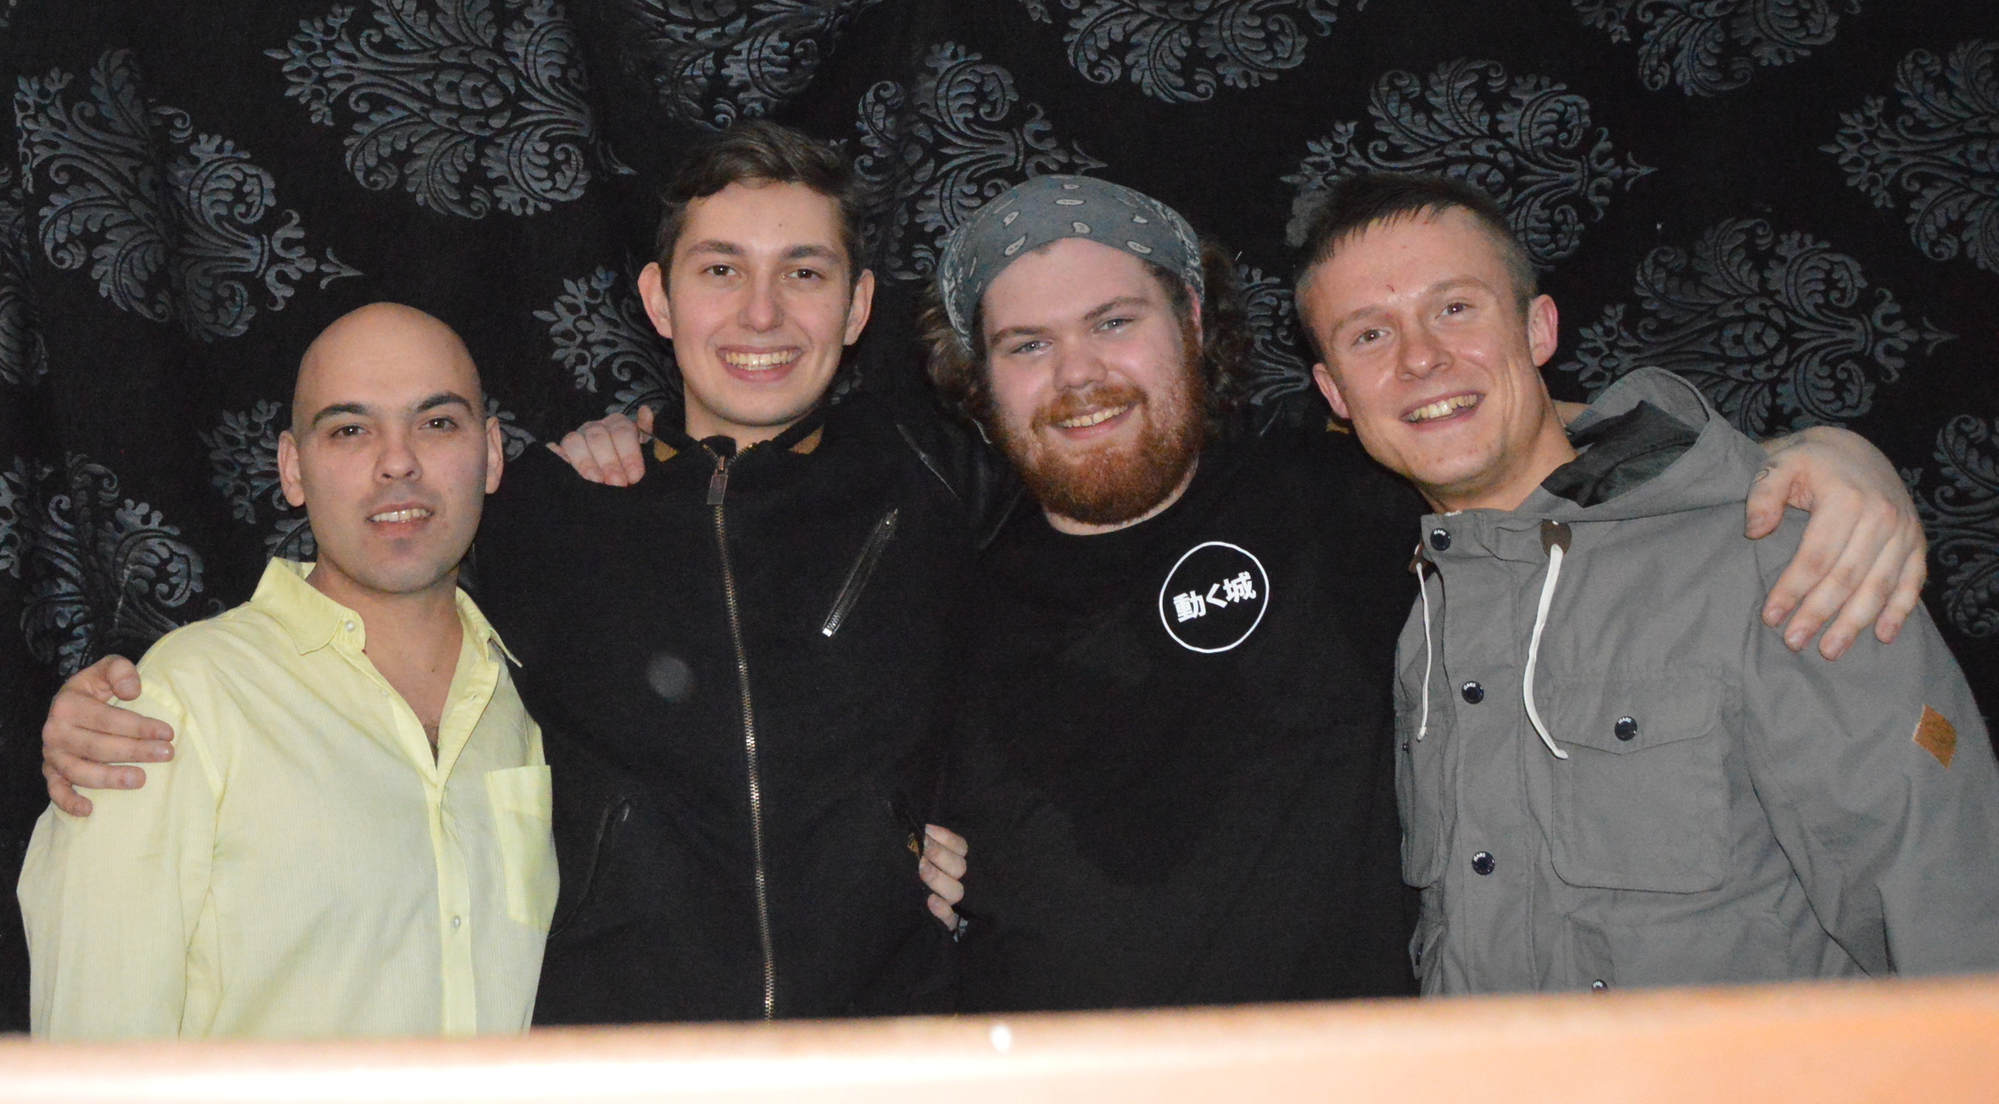 From left to right:Willie G, Frame, XelaZen, Joshua Surreal